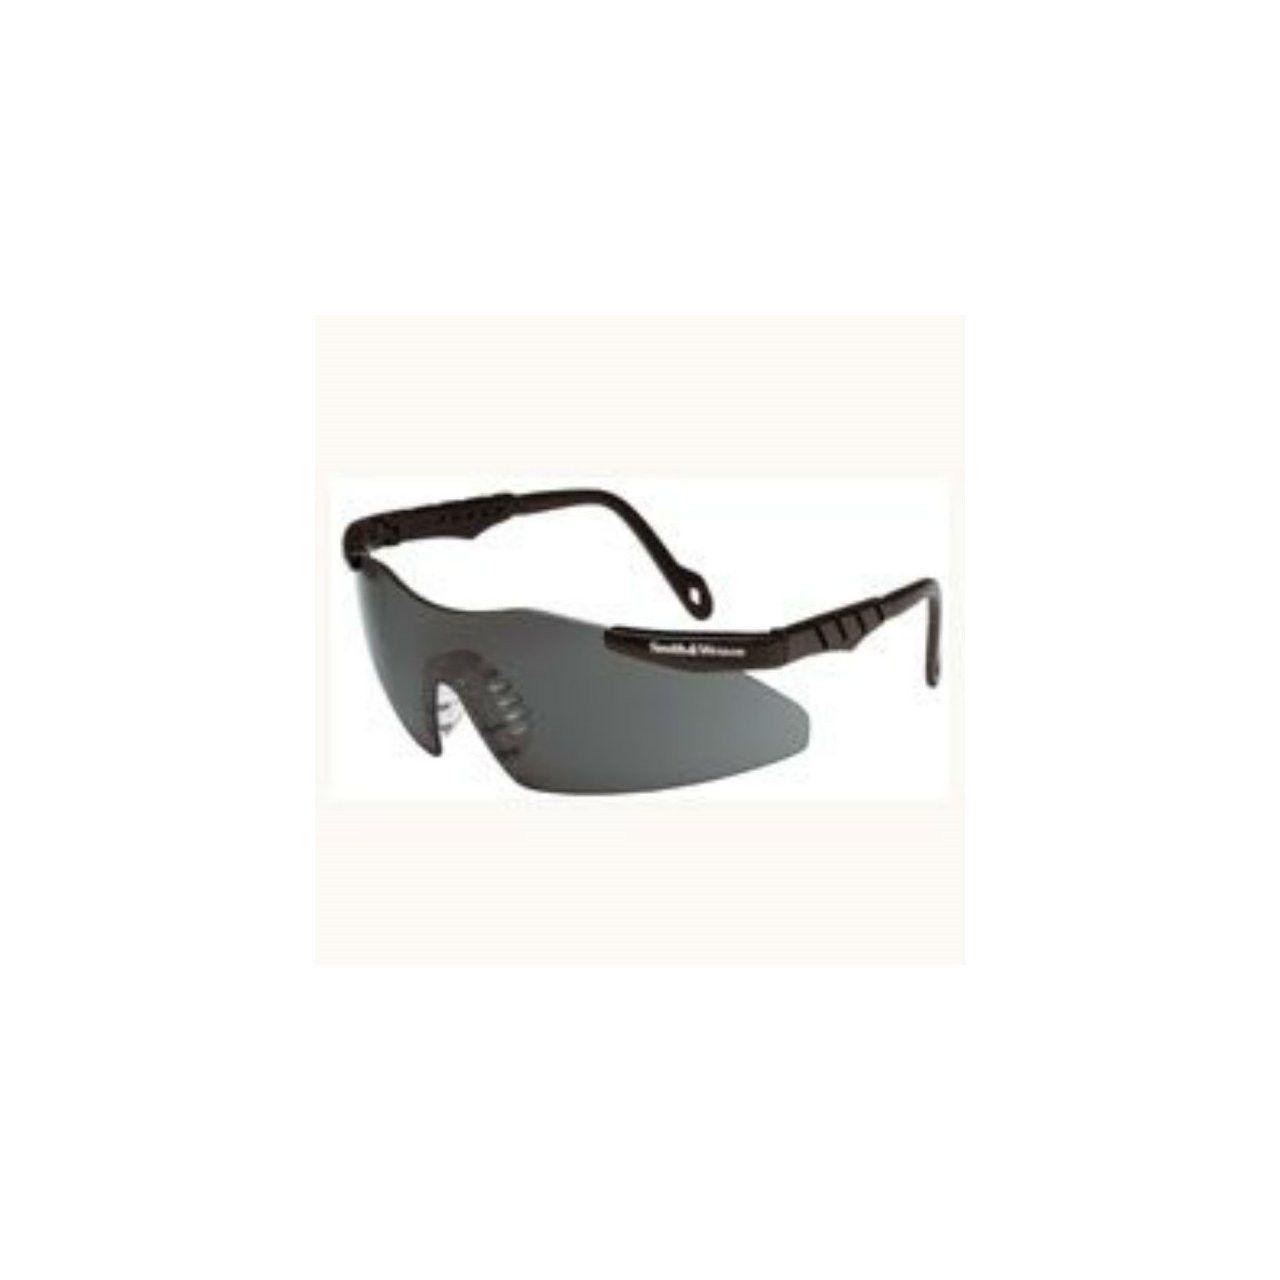 e17d43fefa87 16 Fascinating Oakley Motorcycle Sunglasses Inspiring Ideas ...